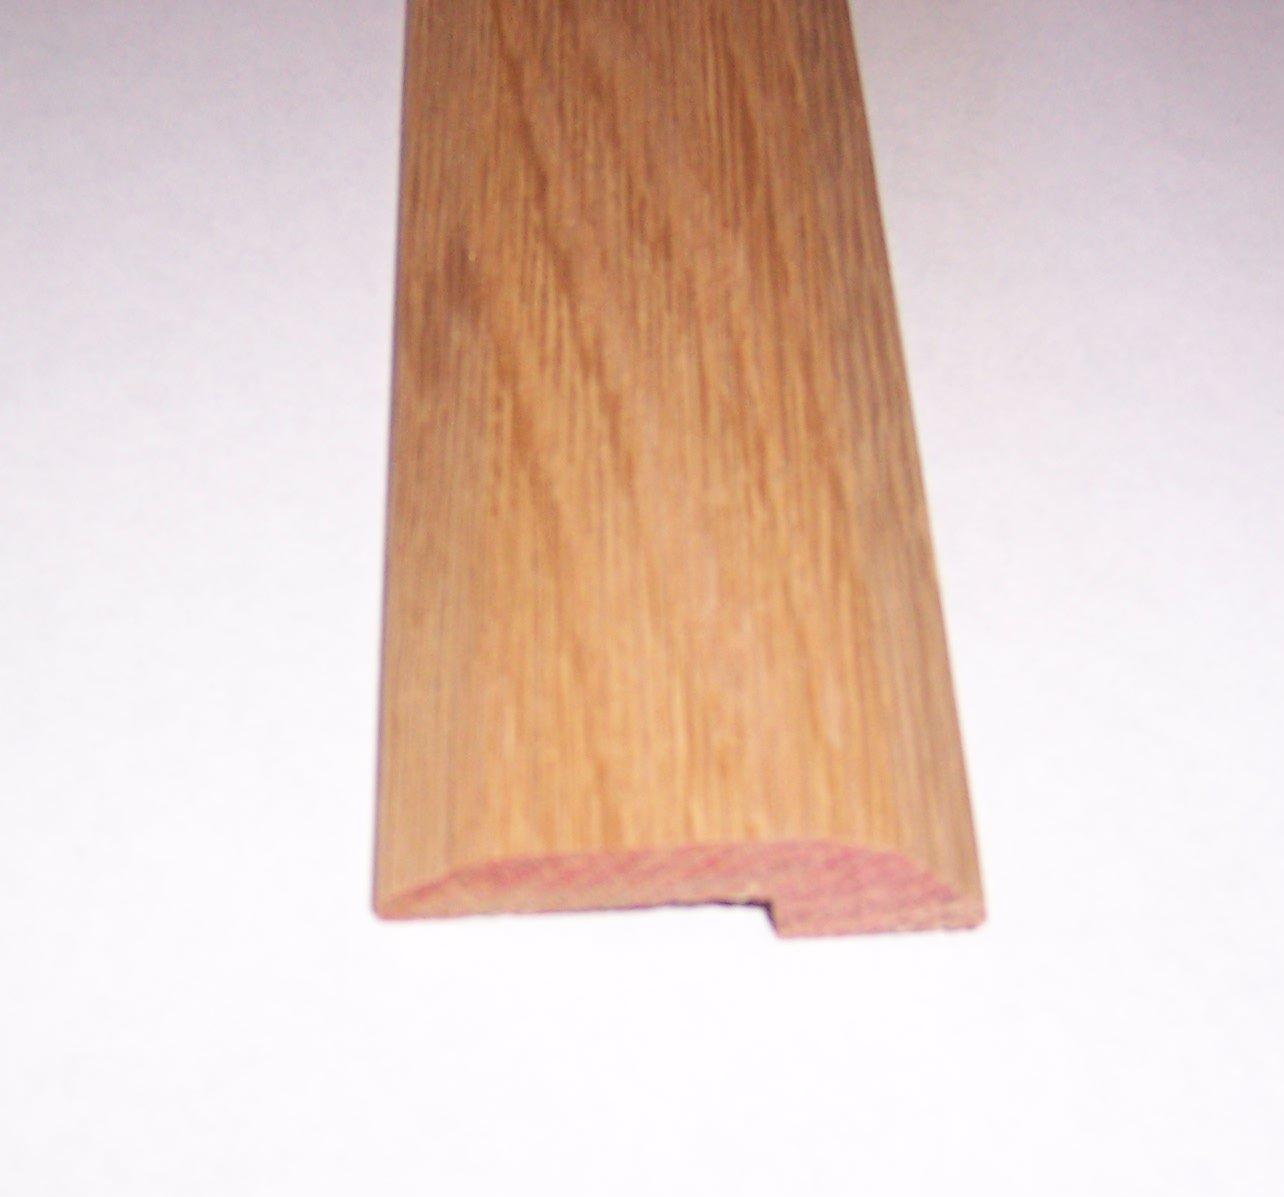 Solid White Oak Interior Threshold - Style 2 (60'')